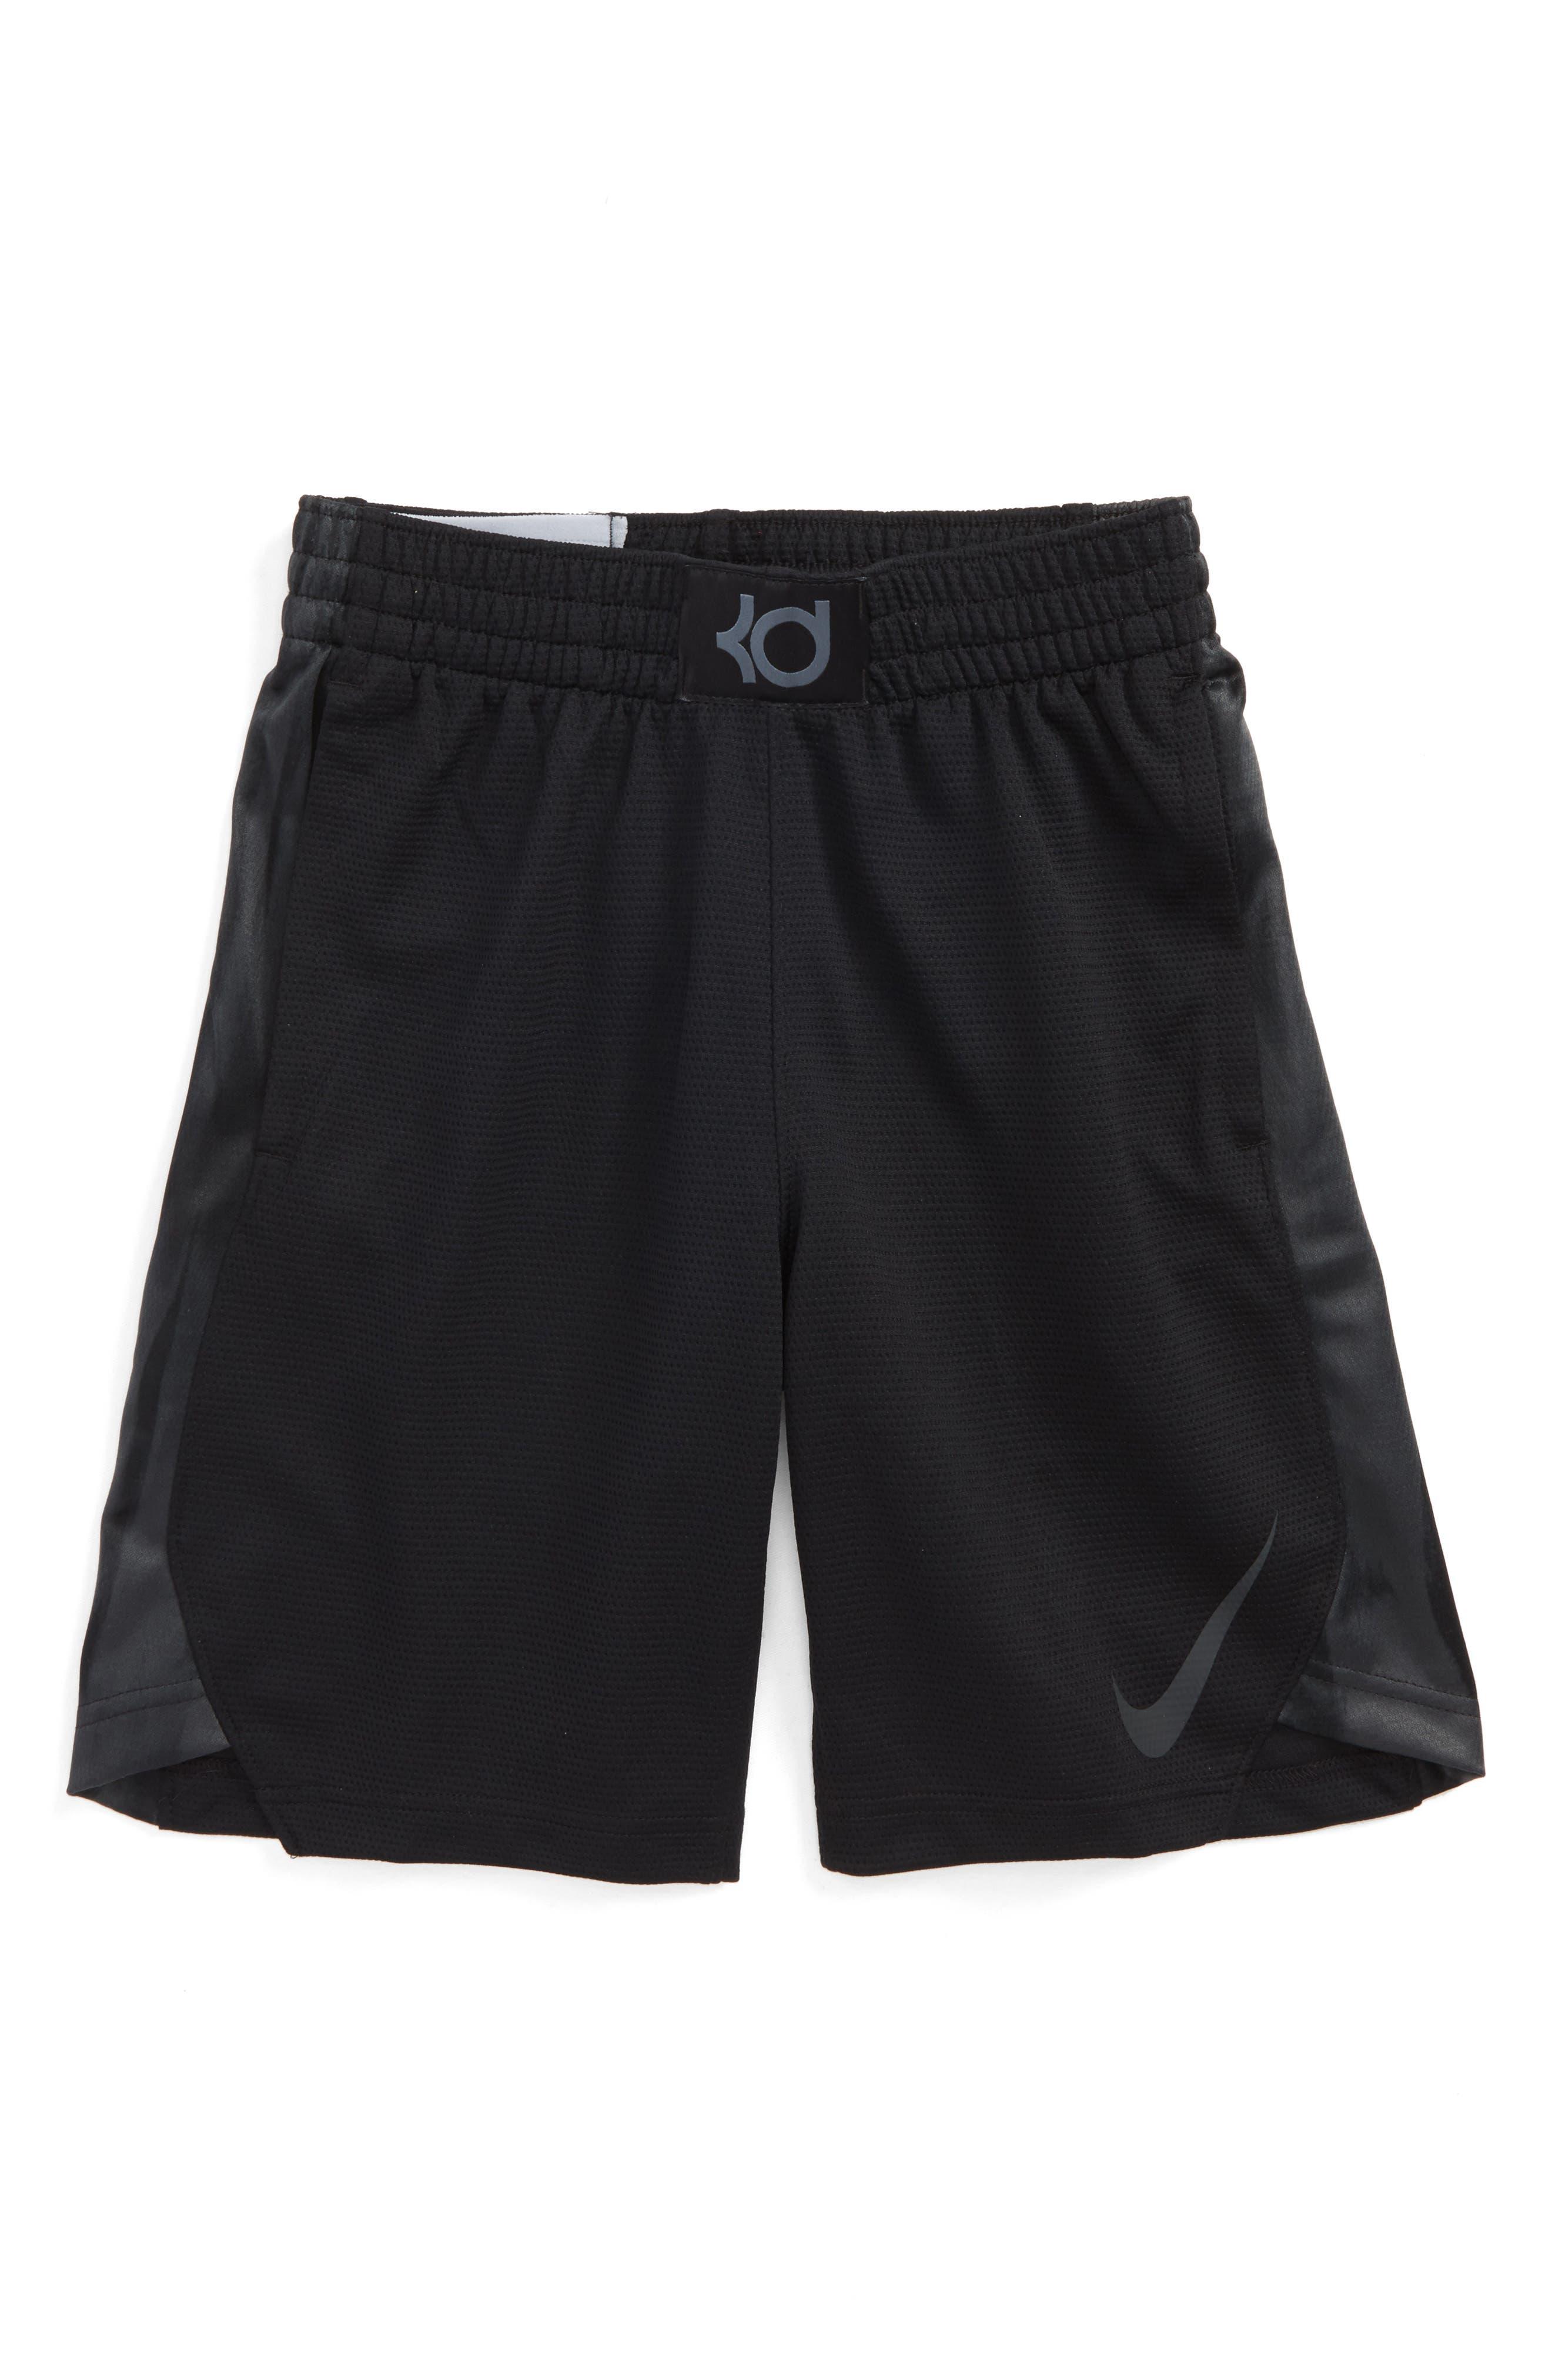 Alternate Image 1 Selected - Nike Kevin Durant Elite Shorts (Little Boys & Big Boys)